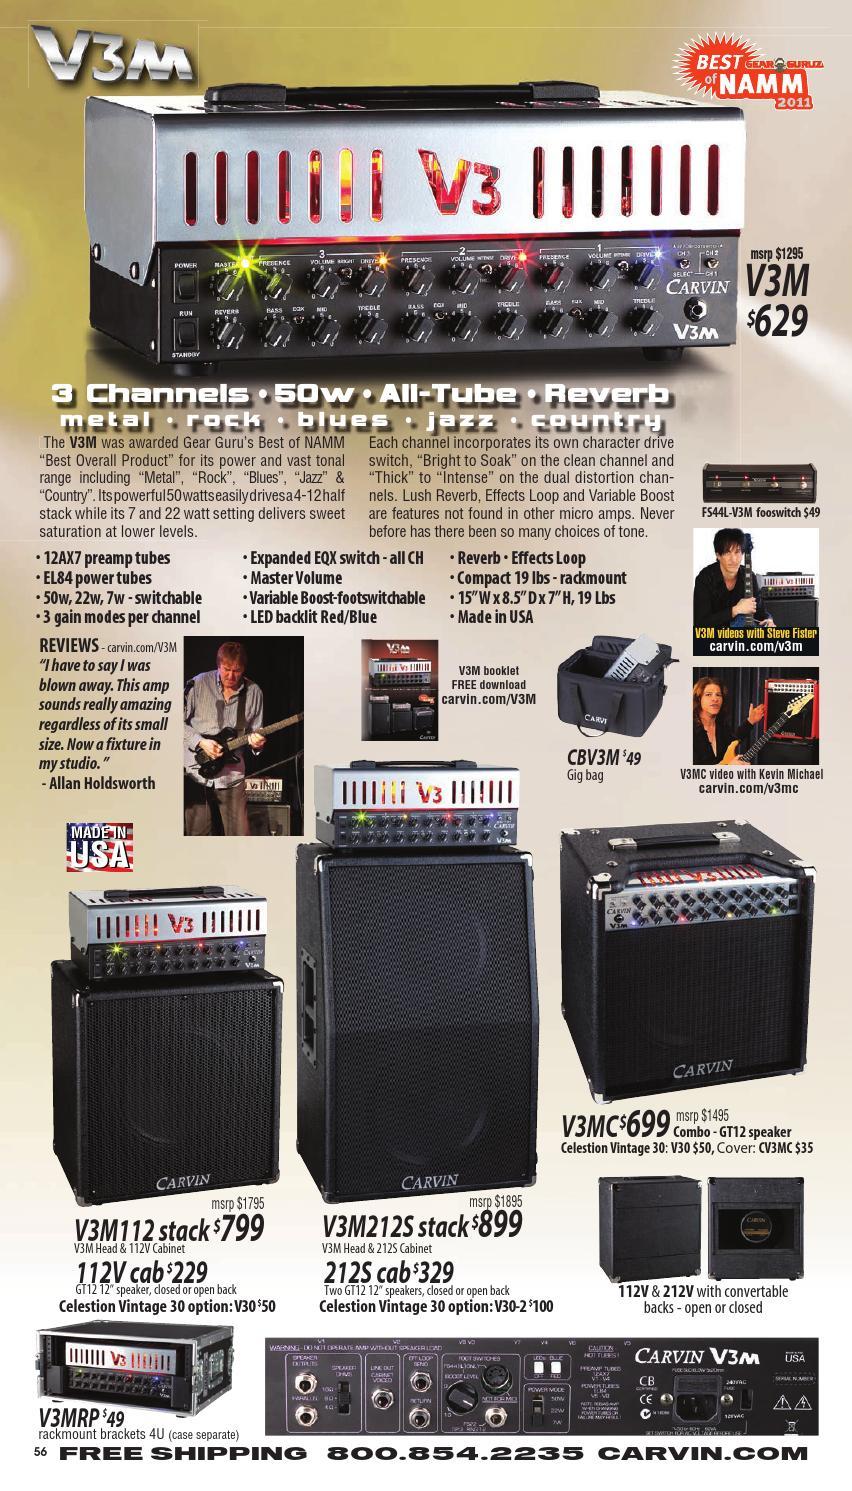 Carvin Sx300 Guitar Amp Schematics Amps Catalog Alex Lopez Issuu 852x1491